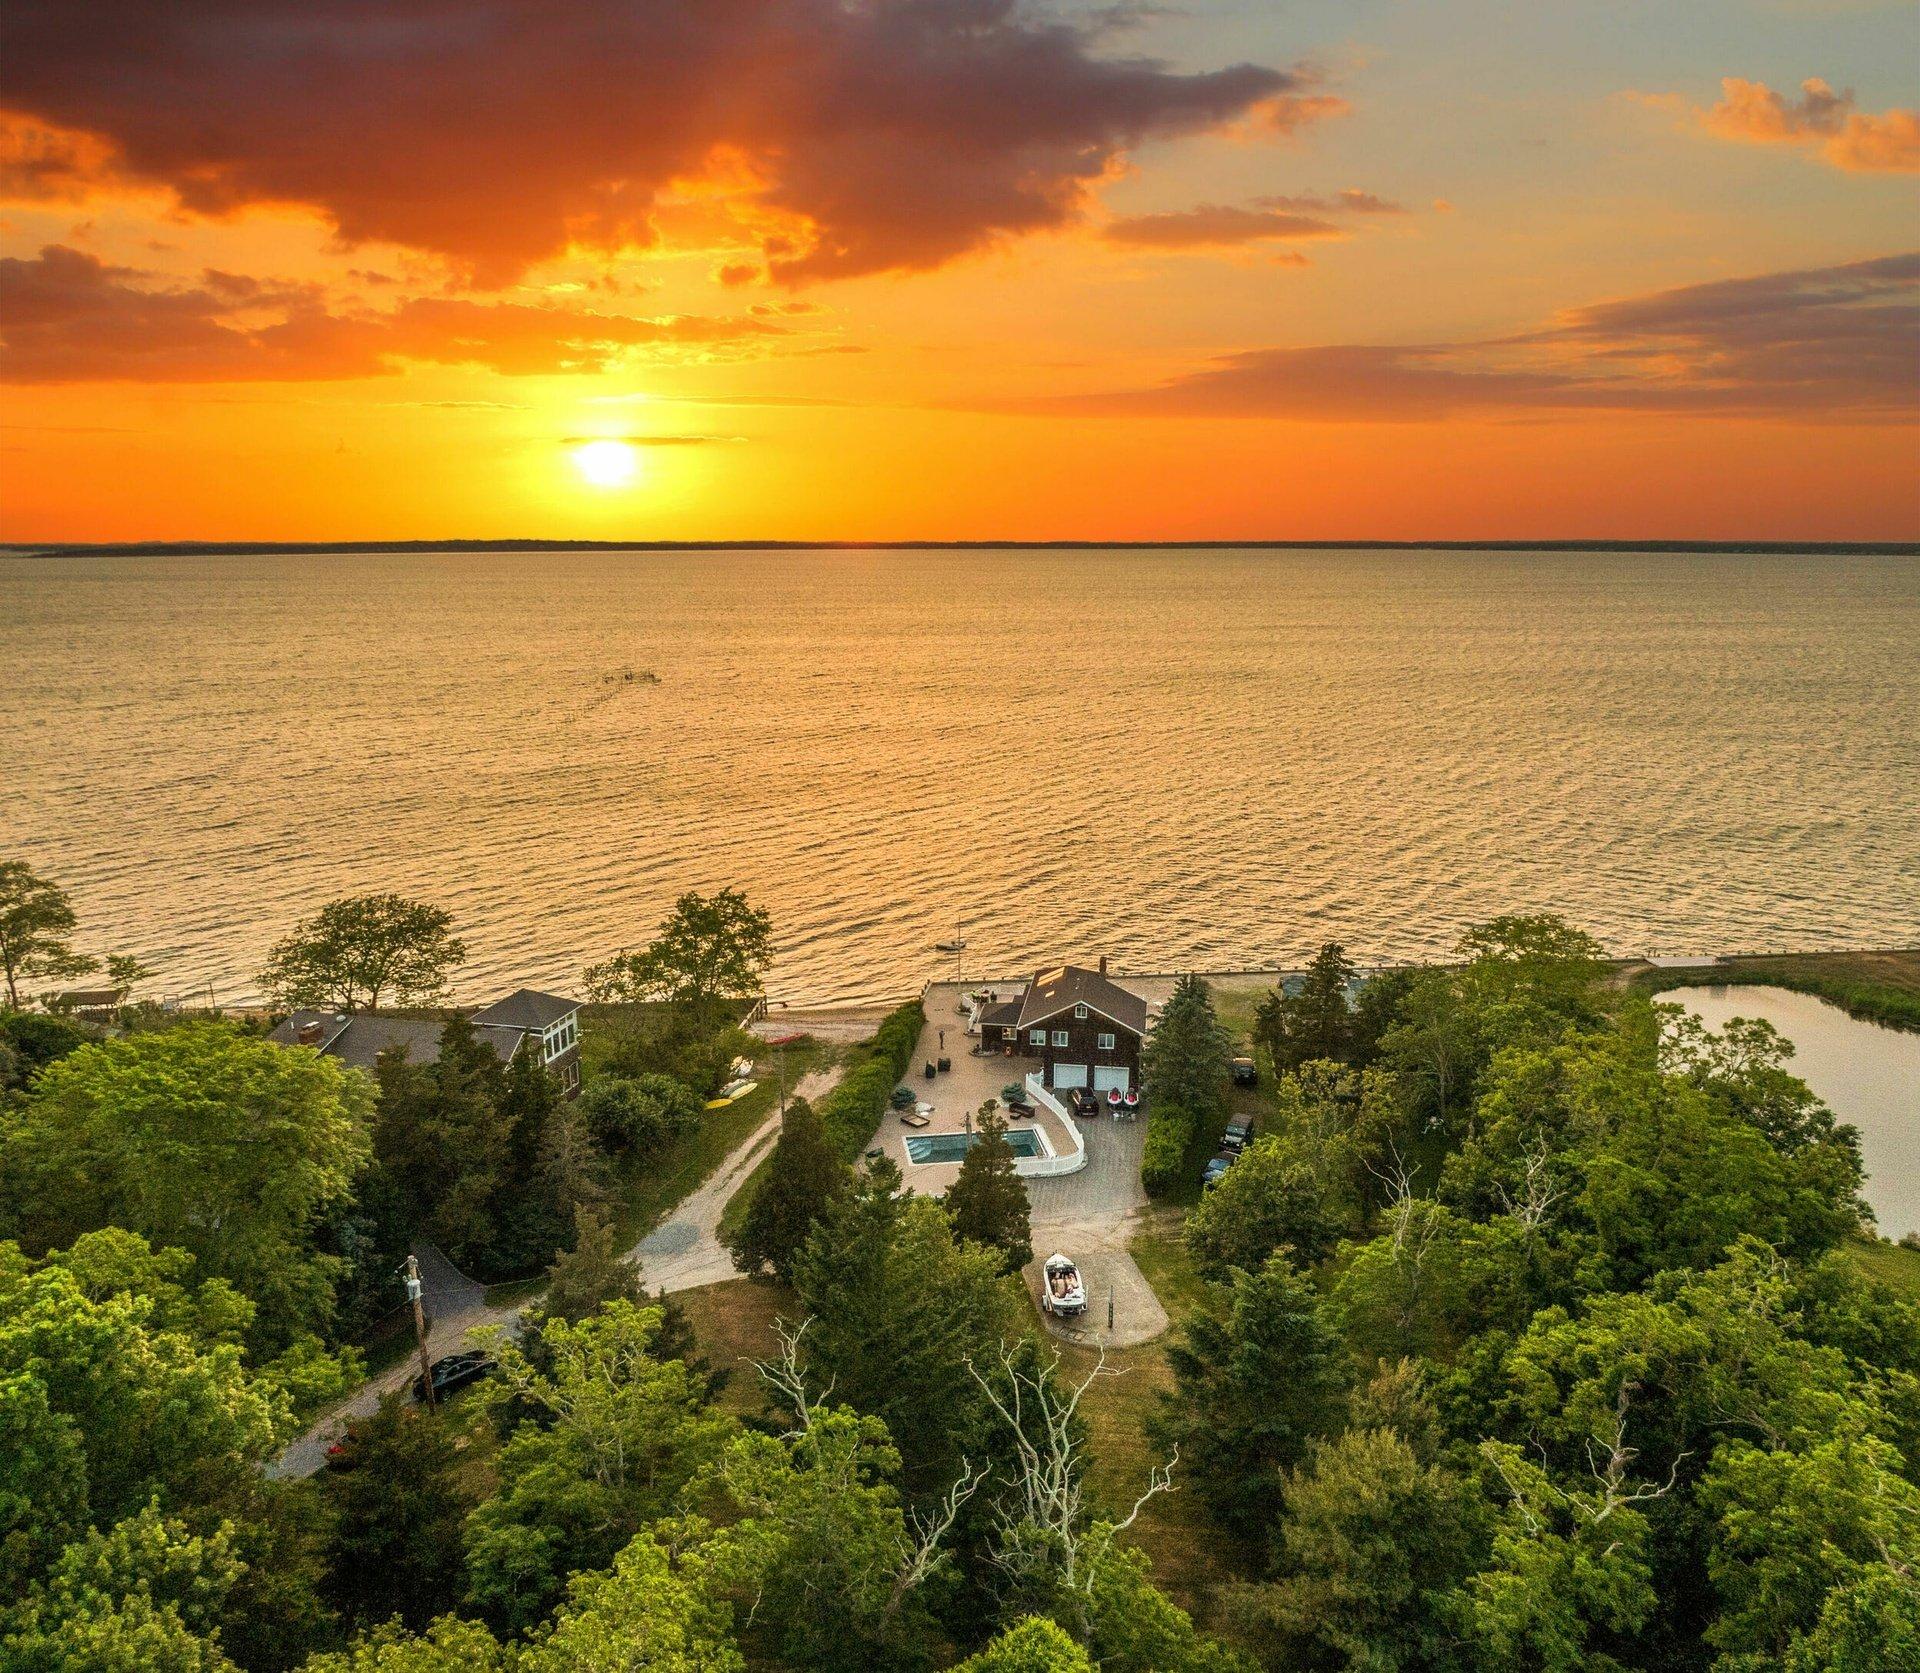 Sag Harbor, New York, United States 1